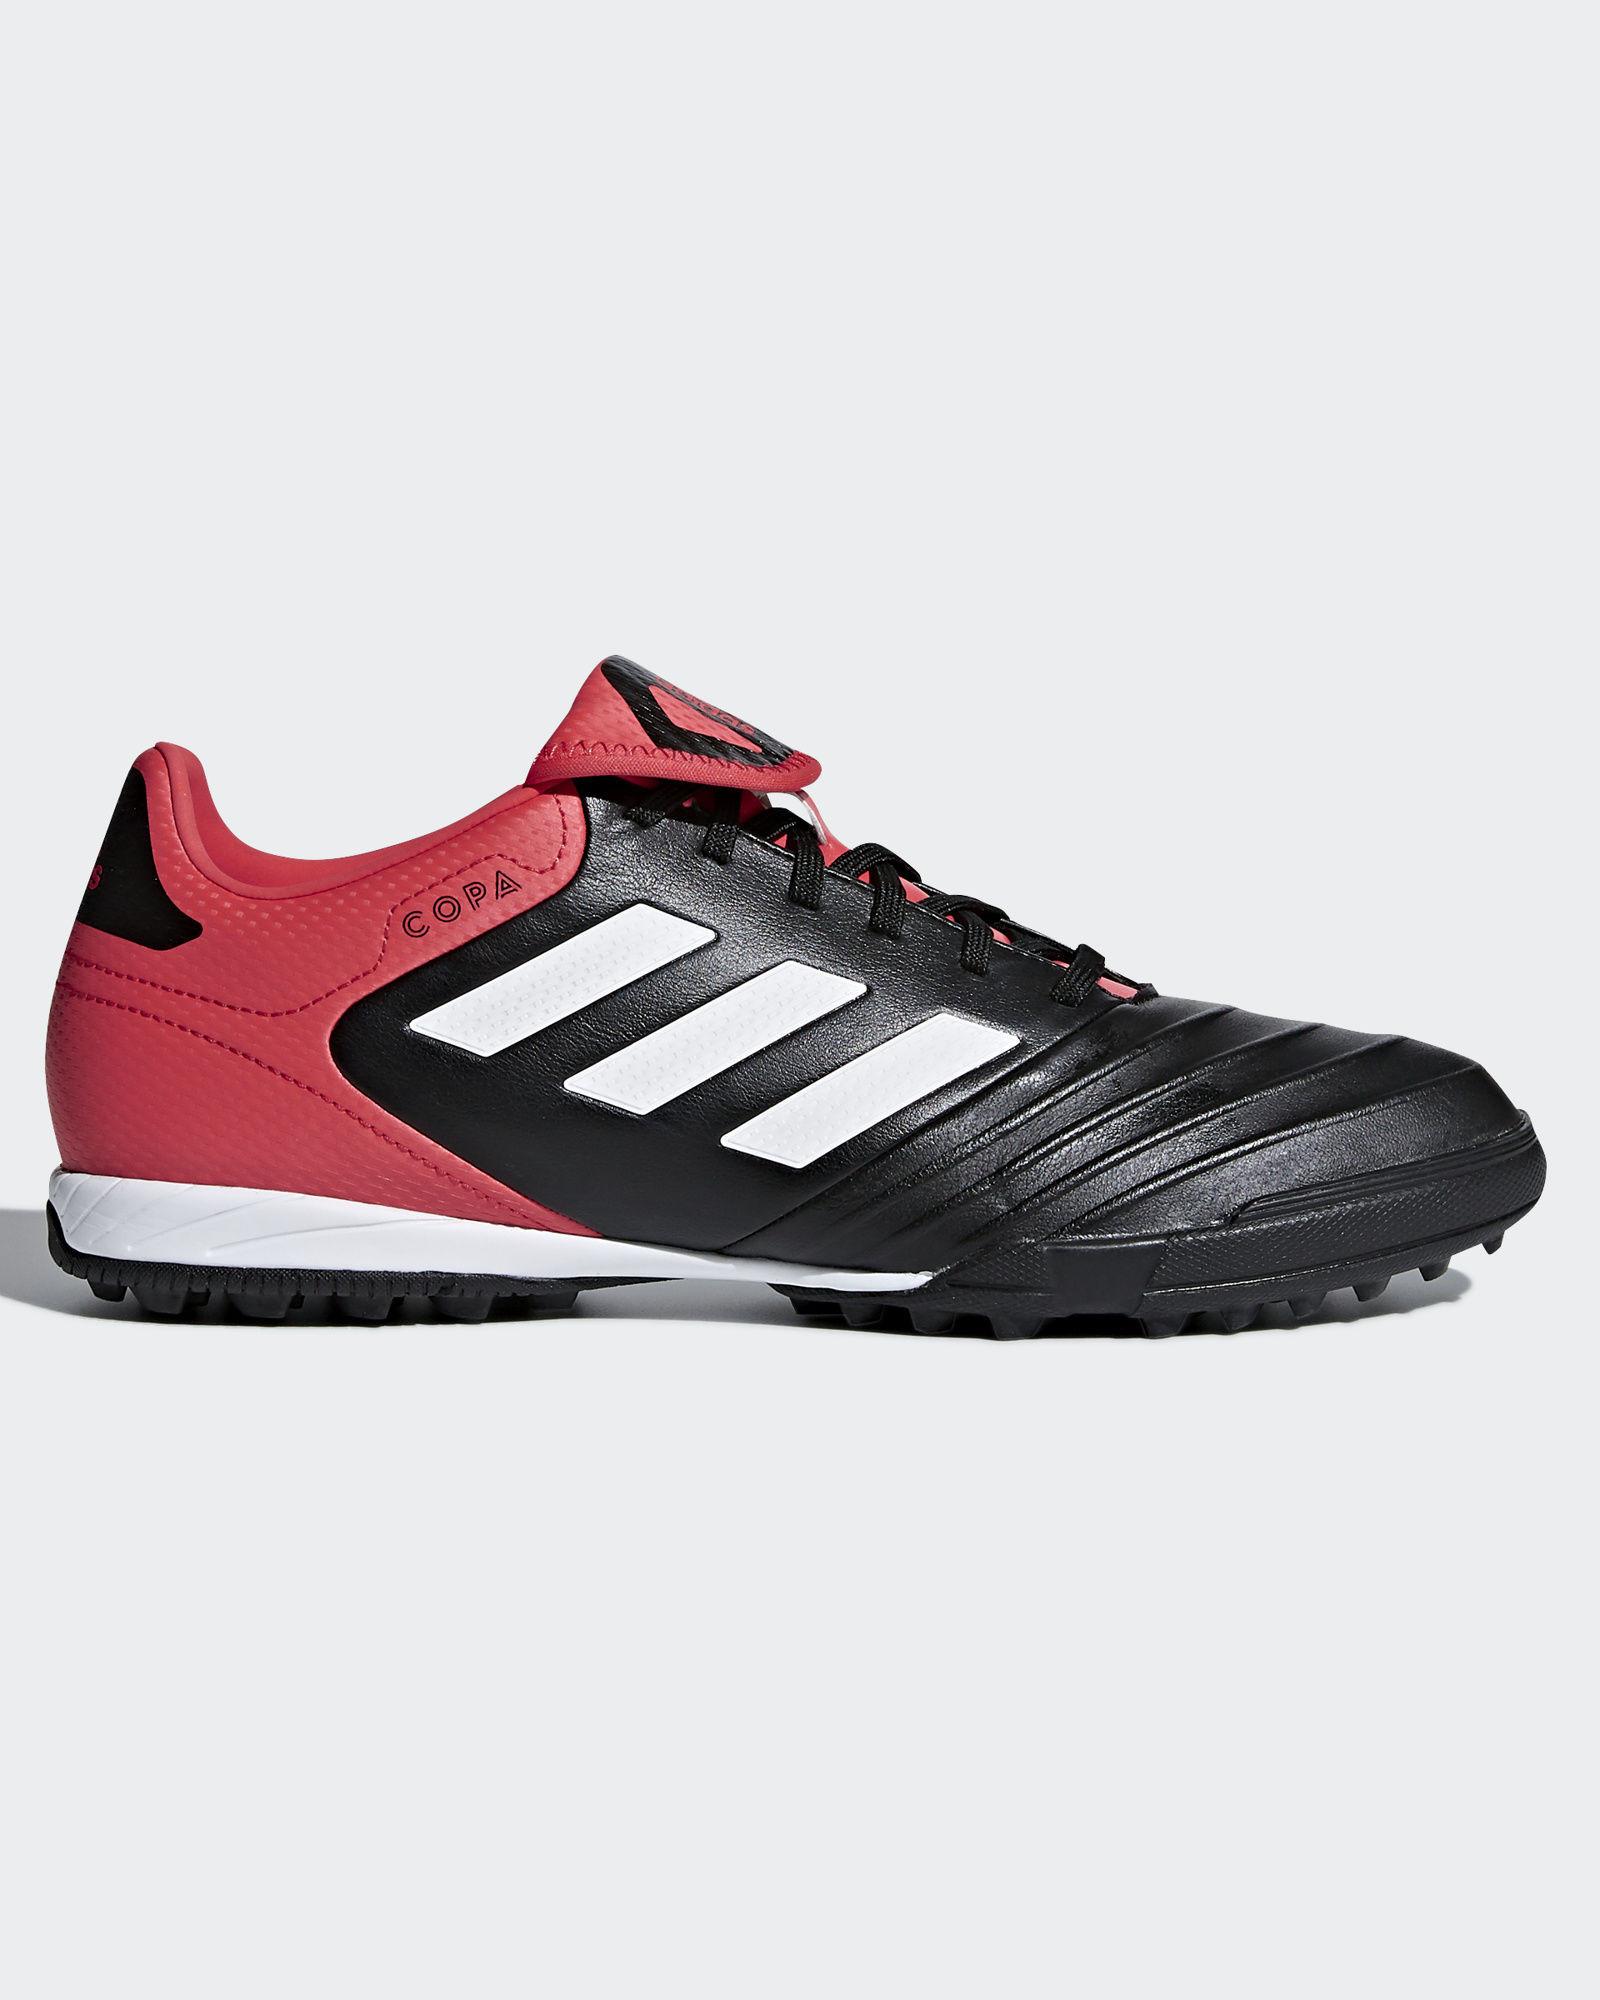 new styles 07197 6eb39 Football-shoes-Adidas-Copa-Tango-18-3-Noir-